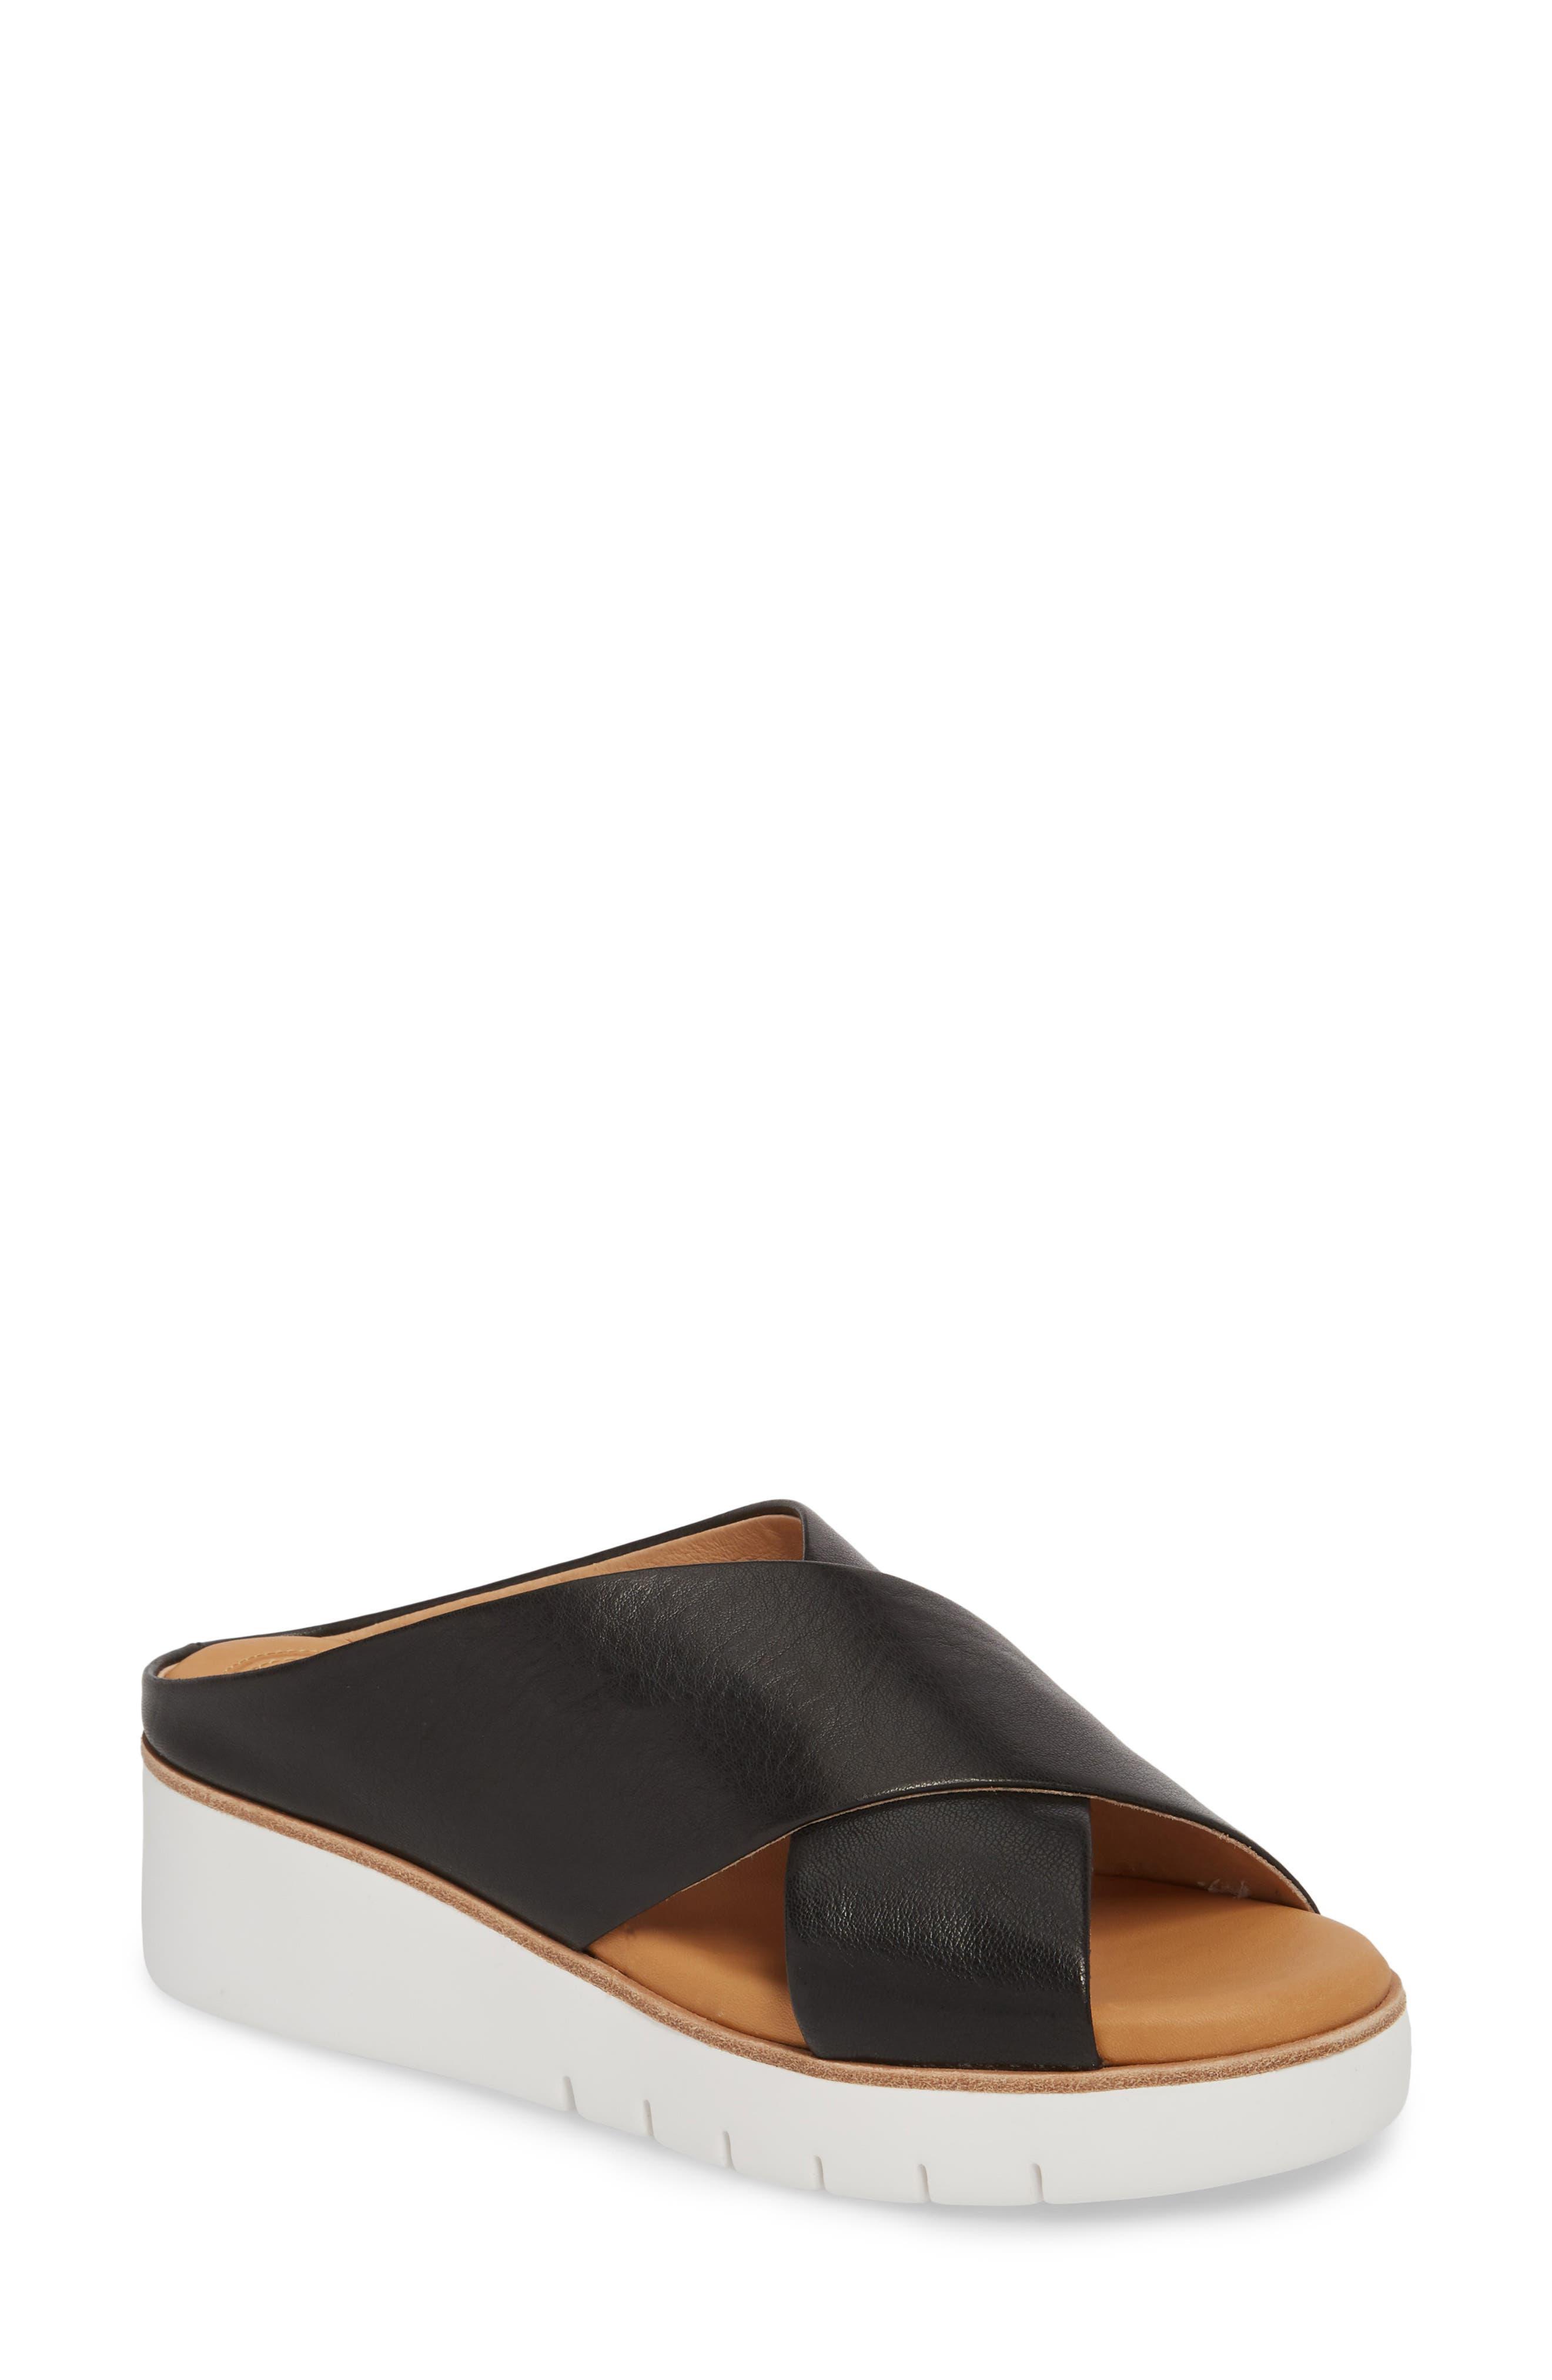 Brunna Sandal,                             Main thumbnail 1, color,                             Black Leather